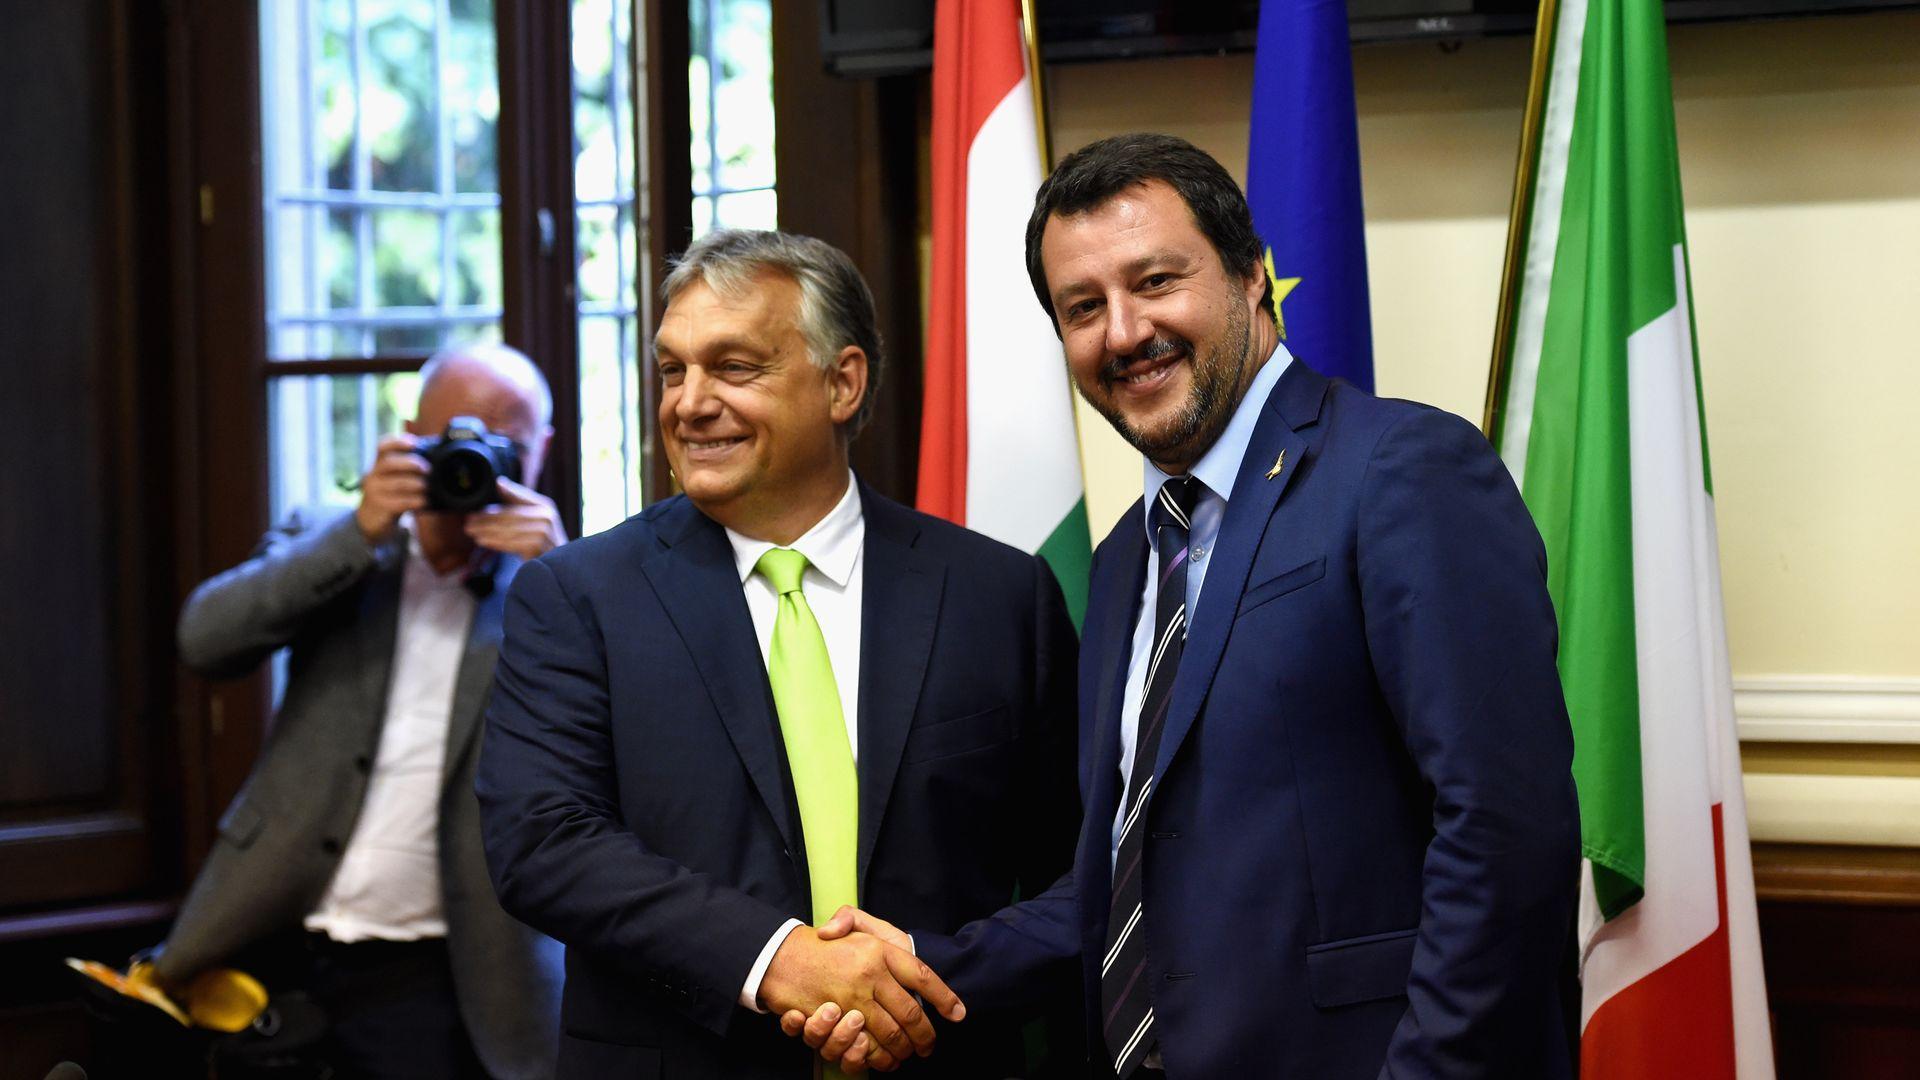 Viktor Orban and Matteo Salvini shaking hands